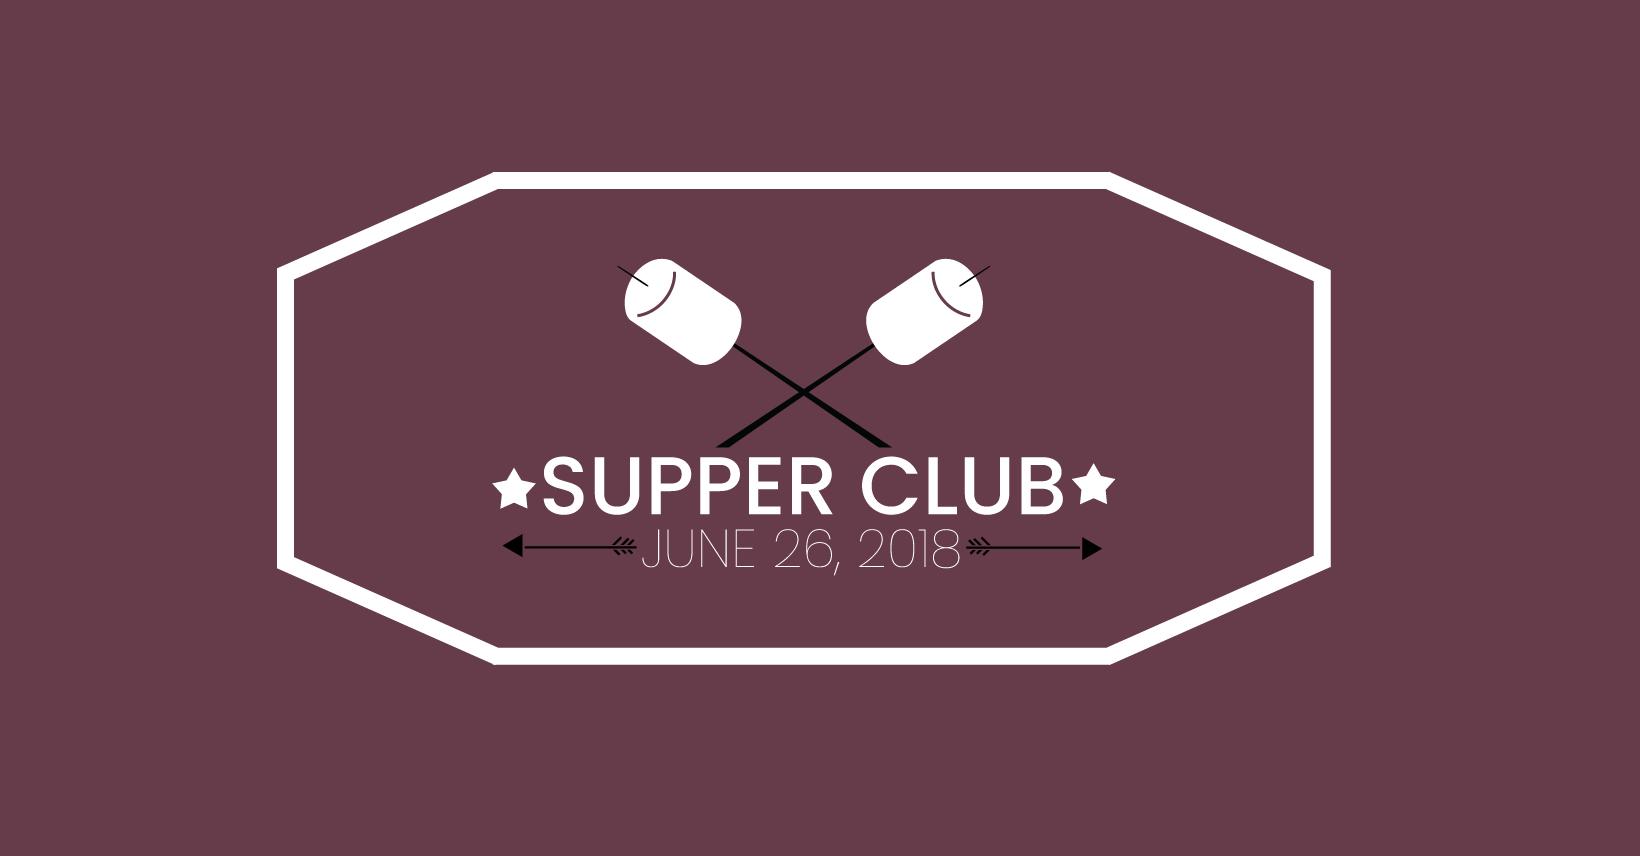 supper-club-6.26.png